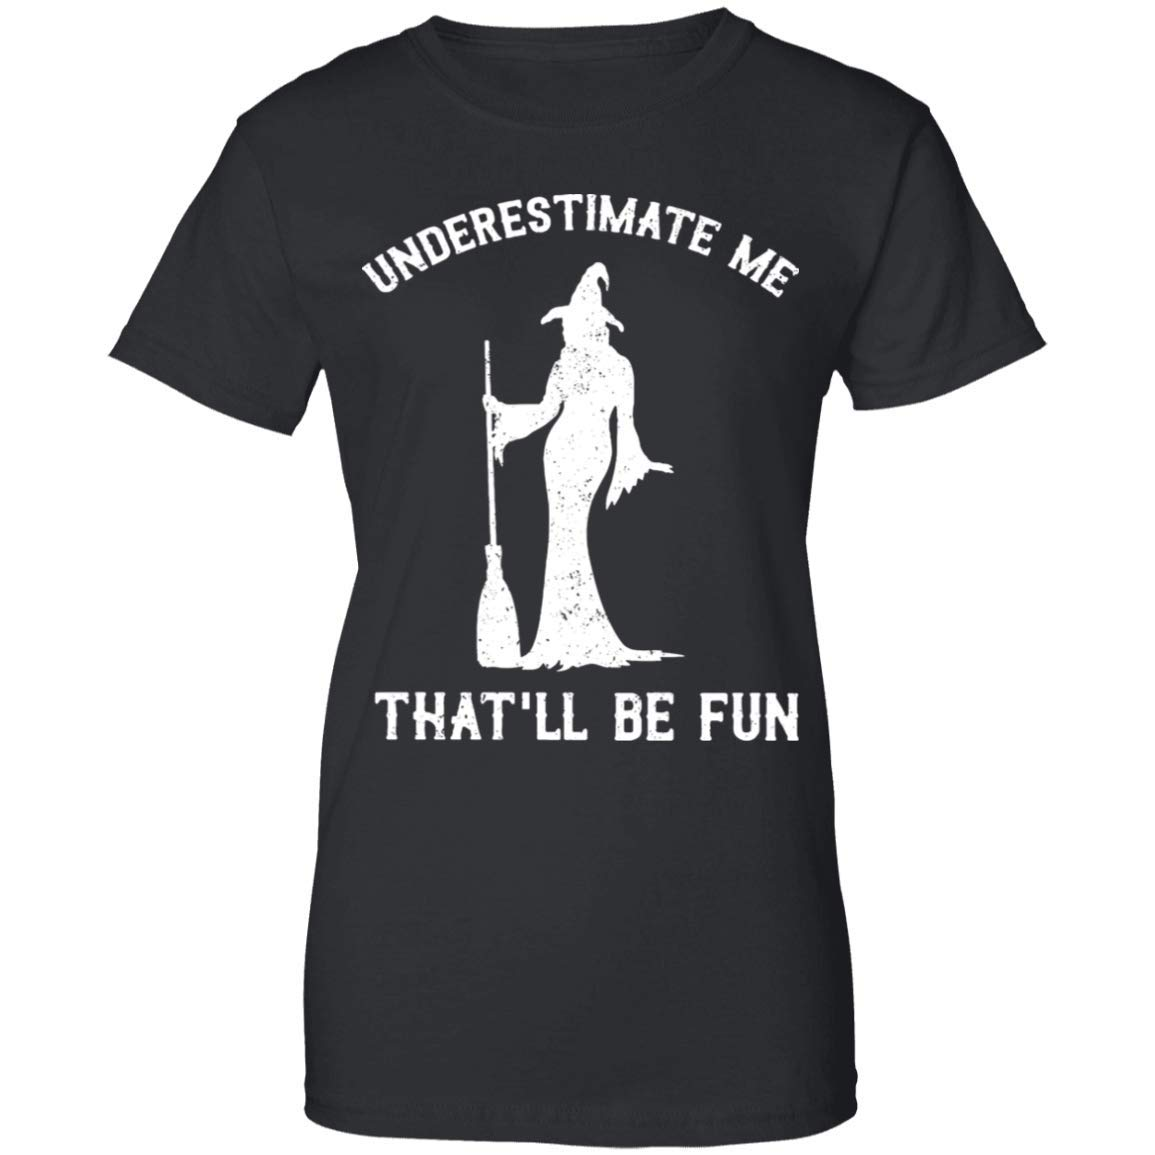 MonMonTee Underestimate Me That/'ll Be Fun T-Shirt